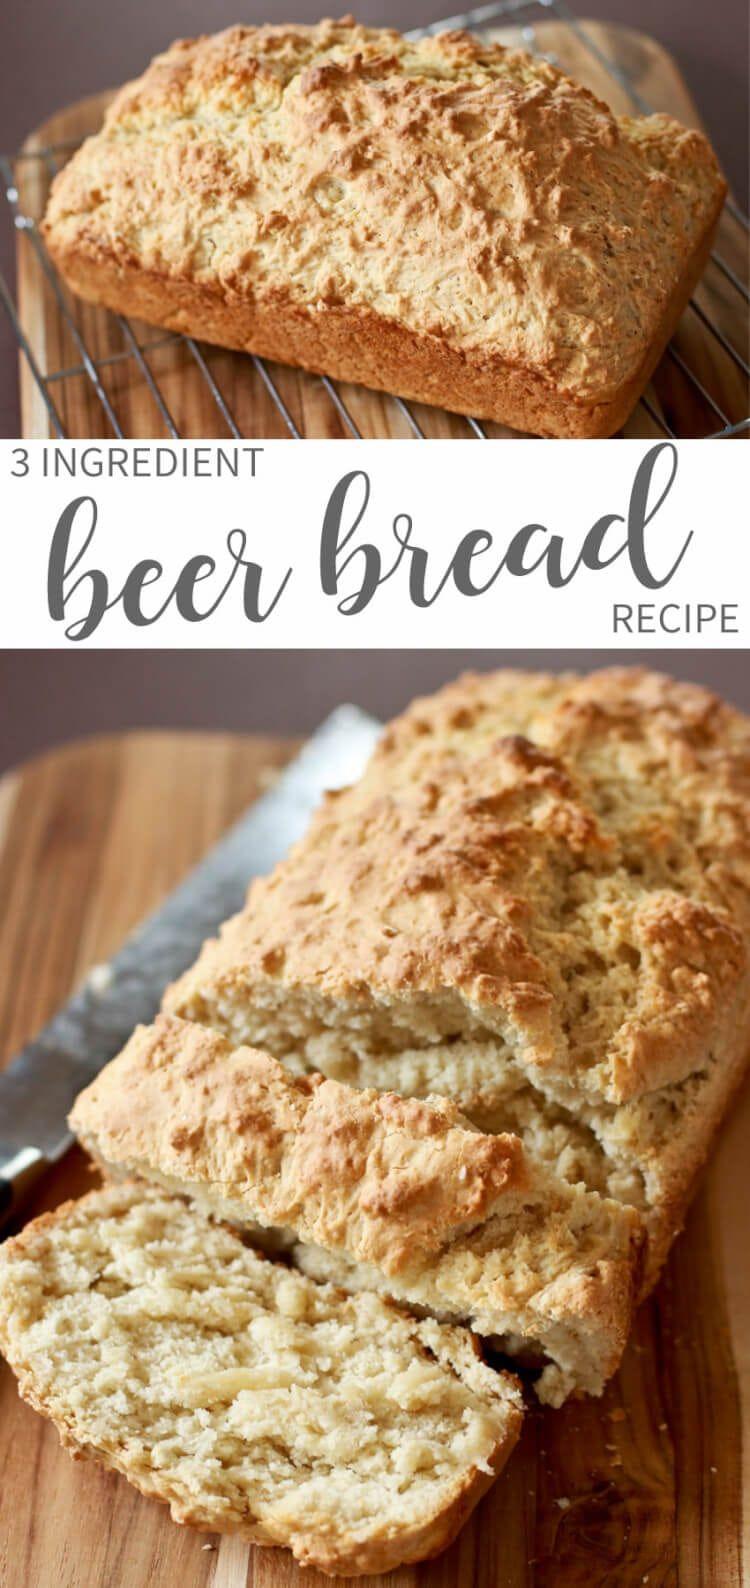 3 Ingredient Beer Bread images